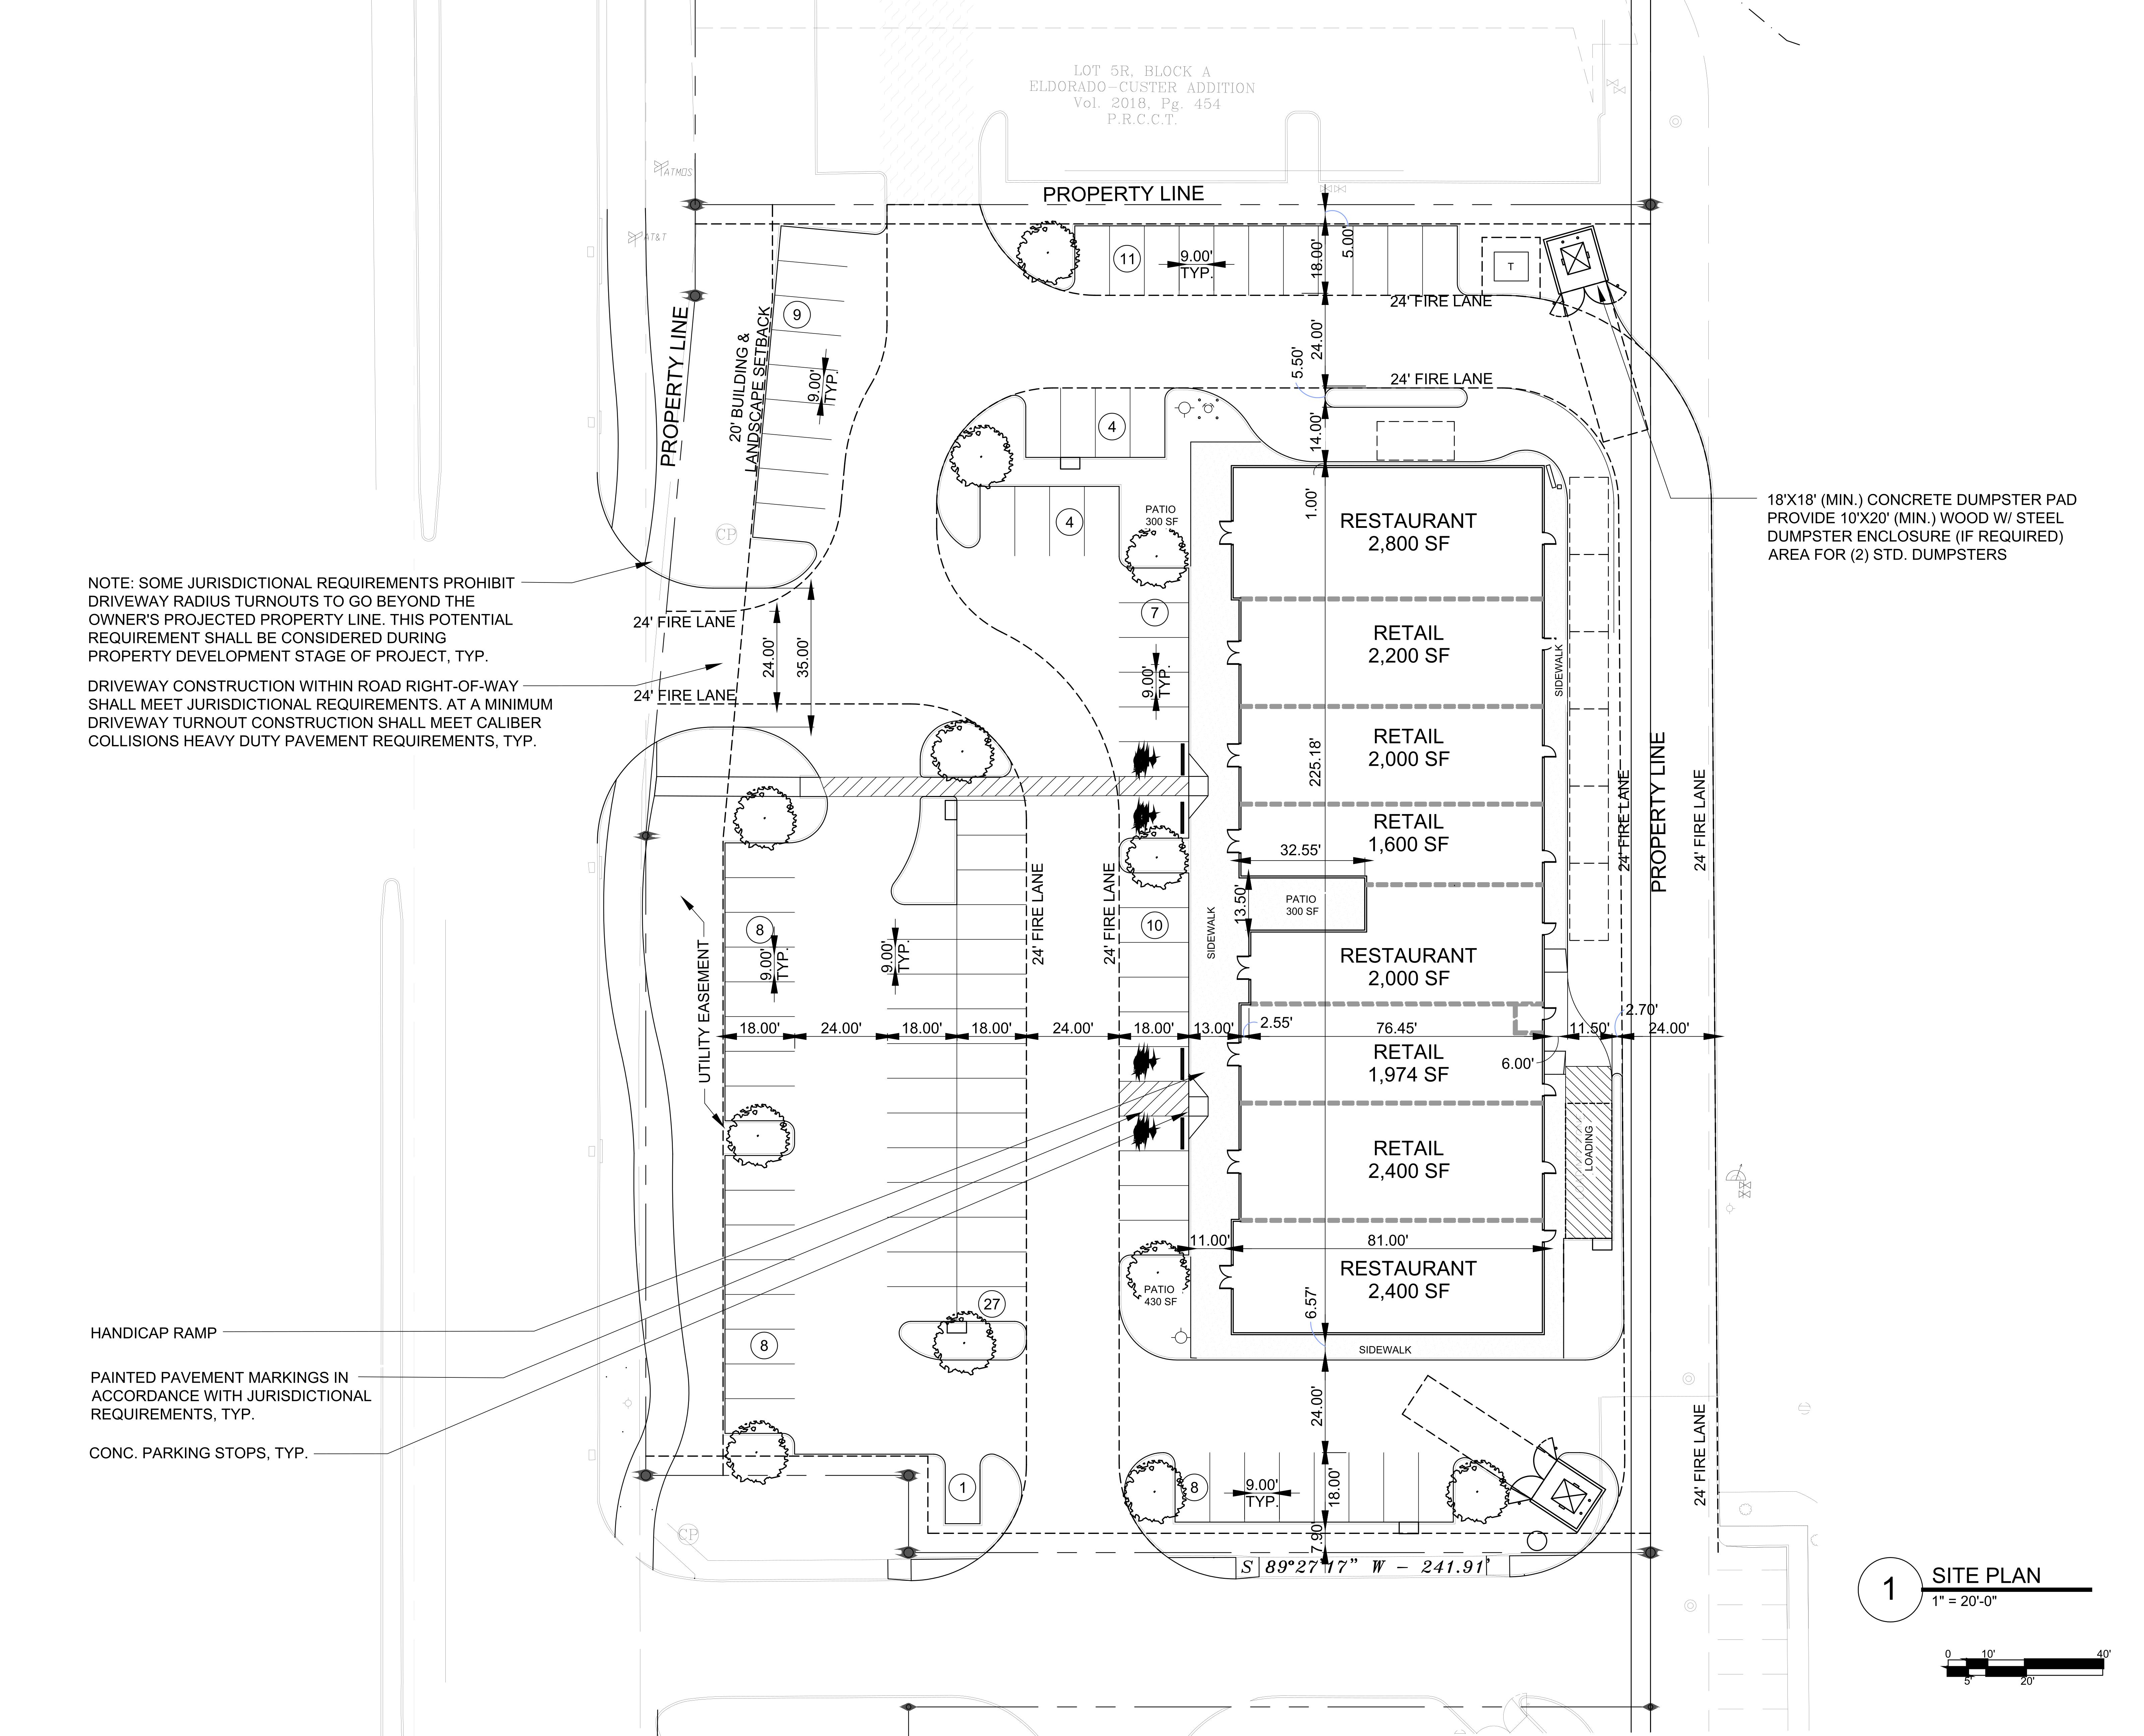 SEQ Custer Rd & Eldorado Pkwy aEUR Phase II: site plan